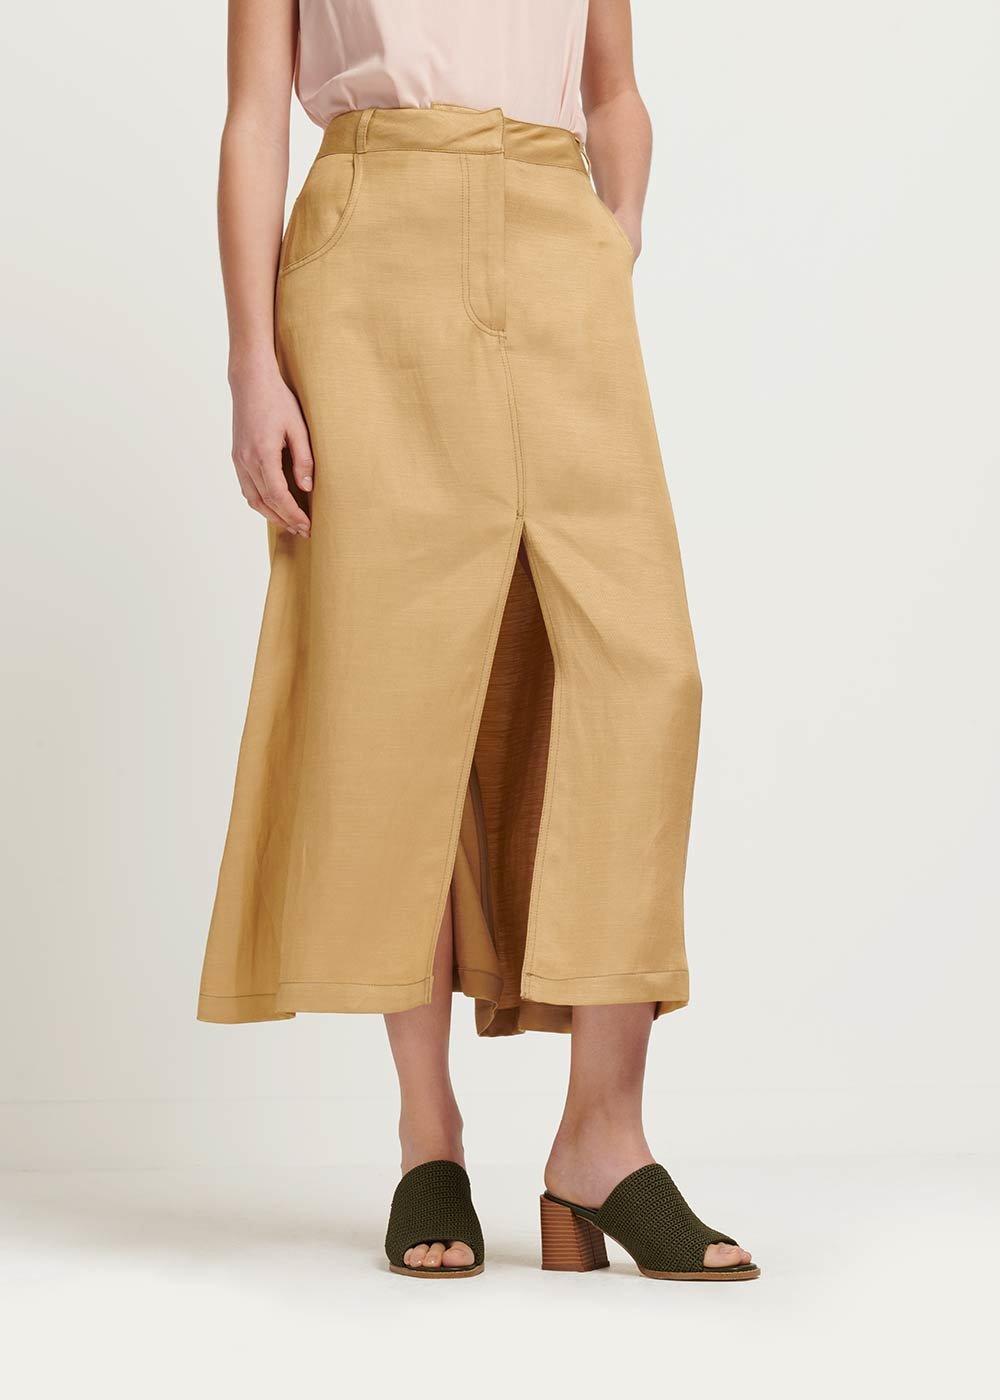 Gaia linen skirt - coconut - Woman